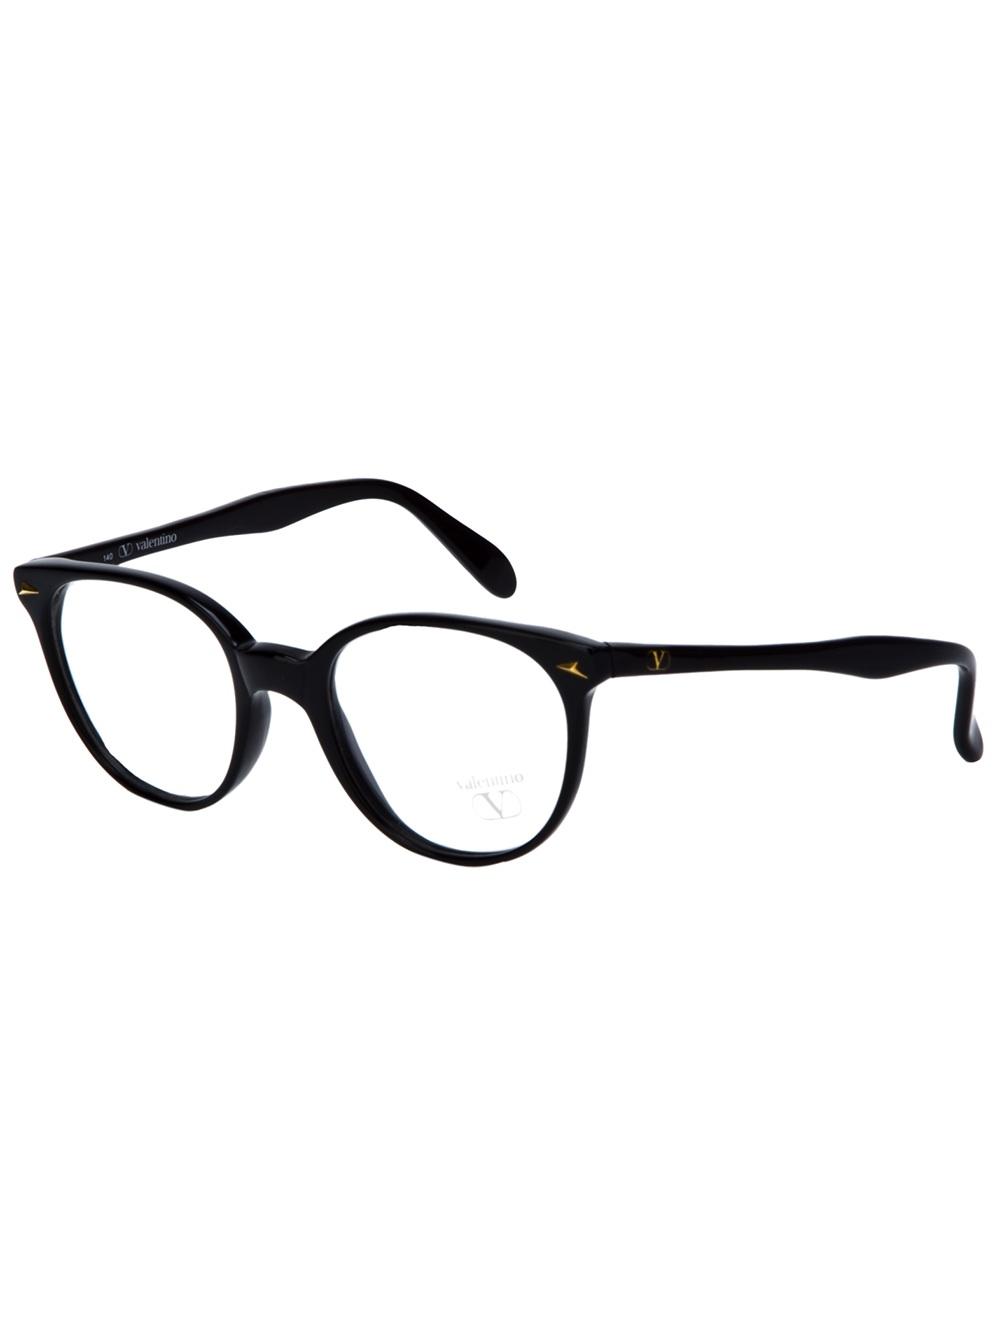 Lyst - Valentino Round Frame Glasses in Black